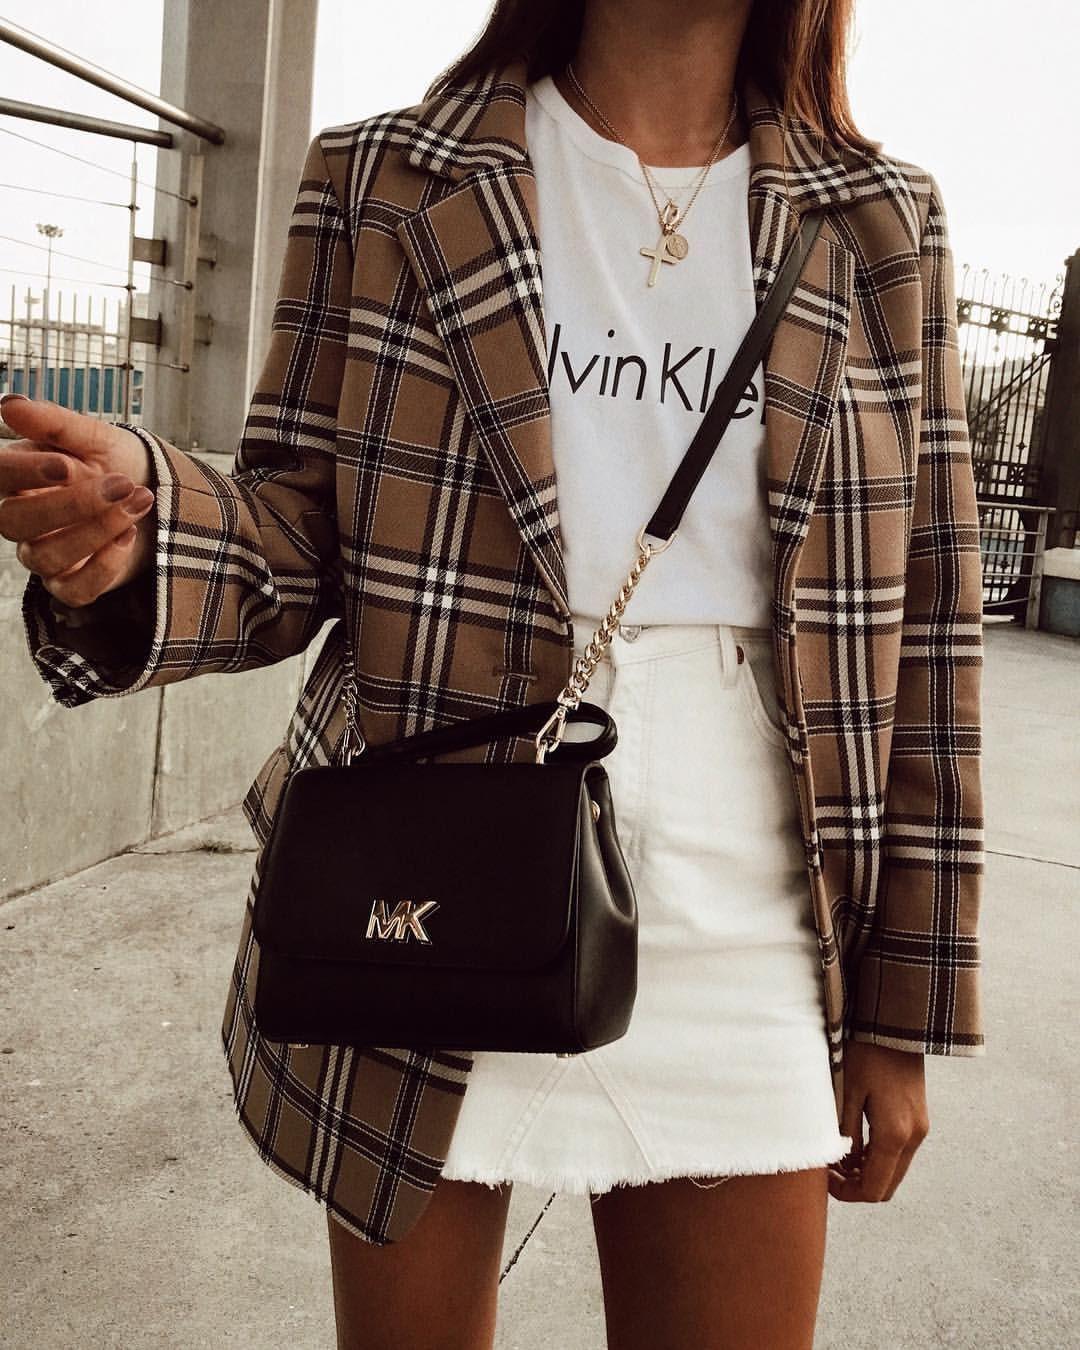 Dresses ideas chic school outfits, street fashion, t shirt